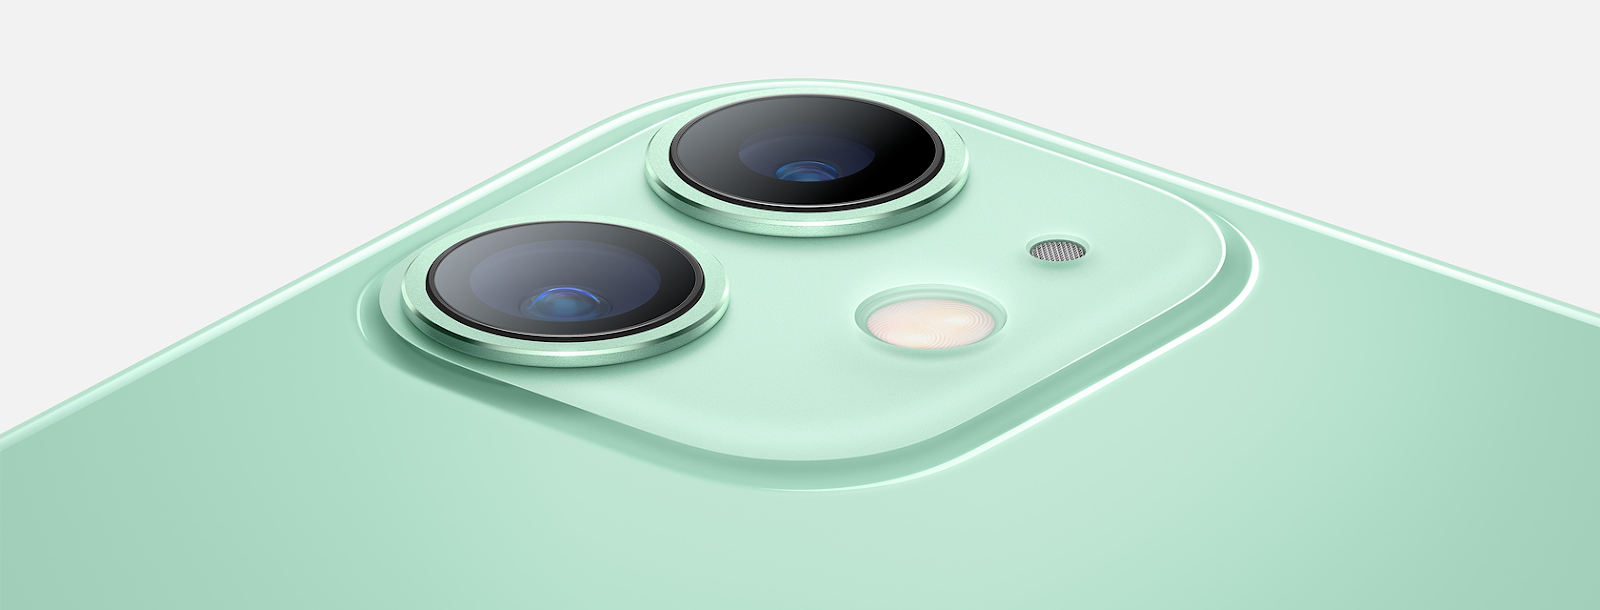 Безопасность Apple iPhone 11 128GB Green